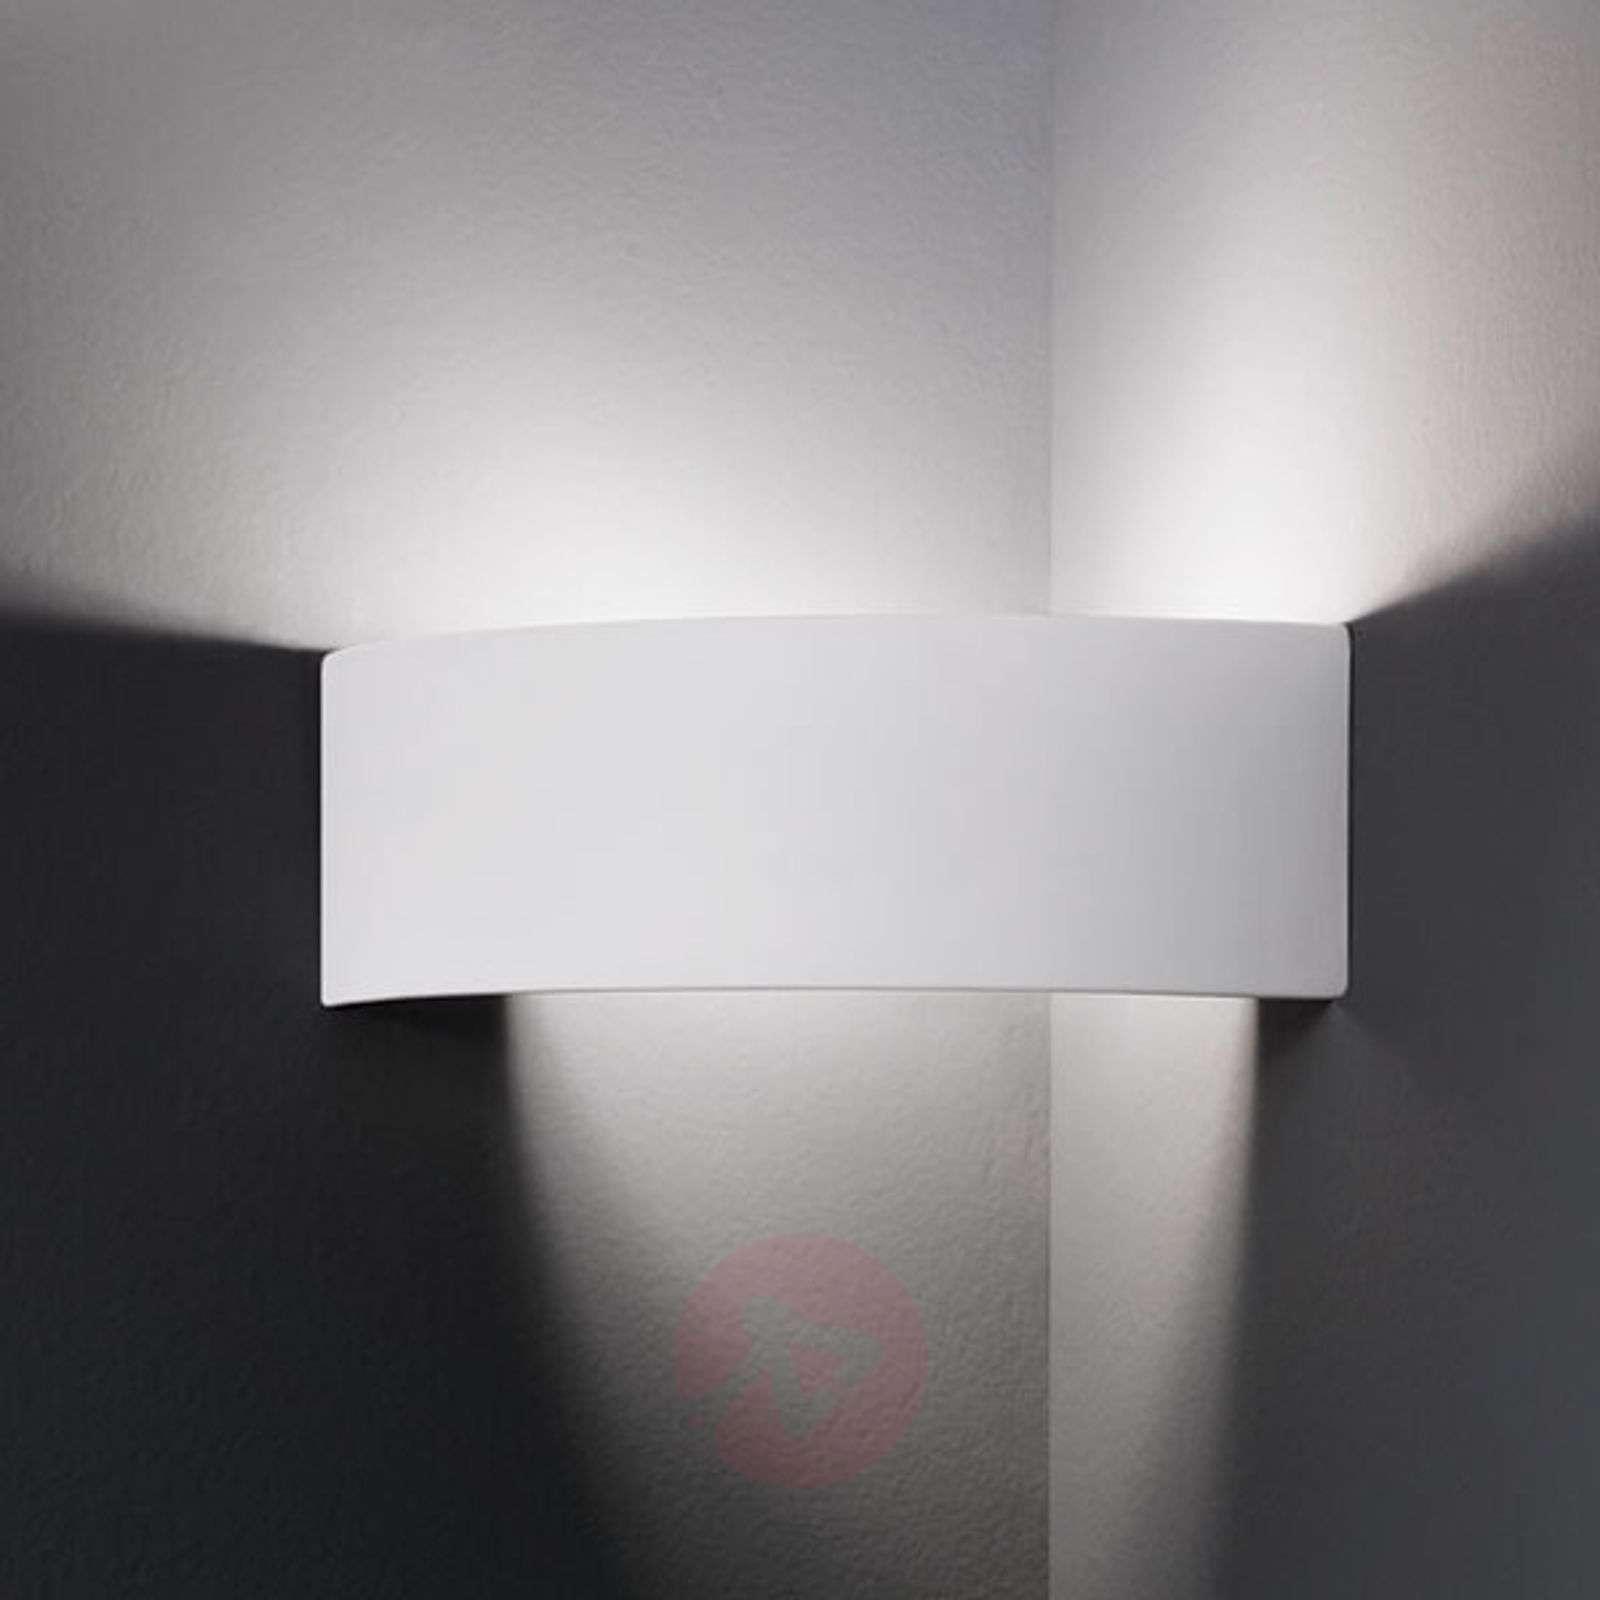 arco lighting. Corner Wall Light Arco-5560167-01 Arco Lighting B